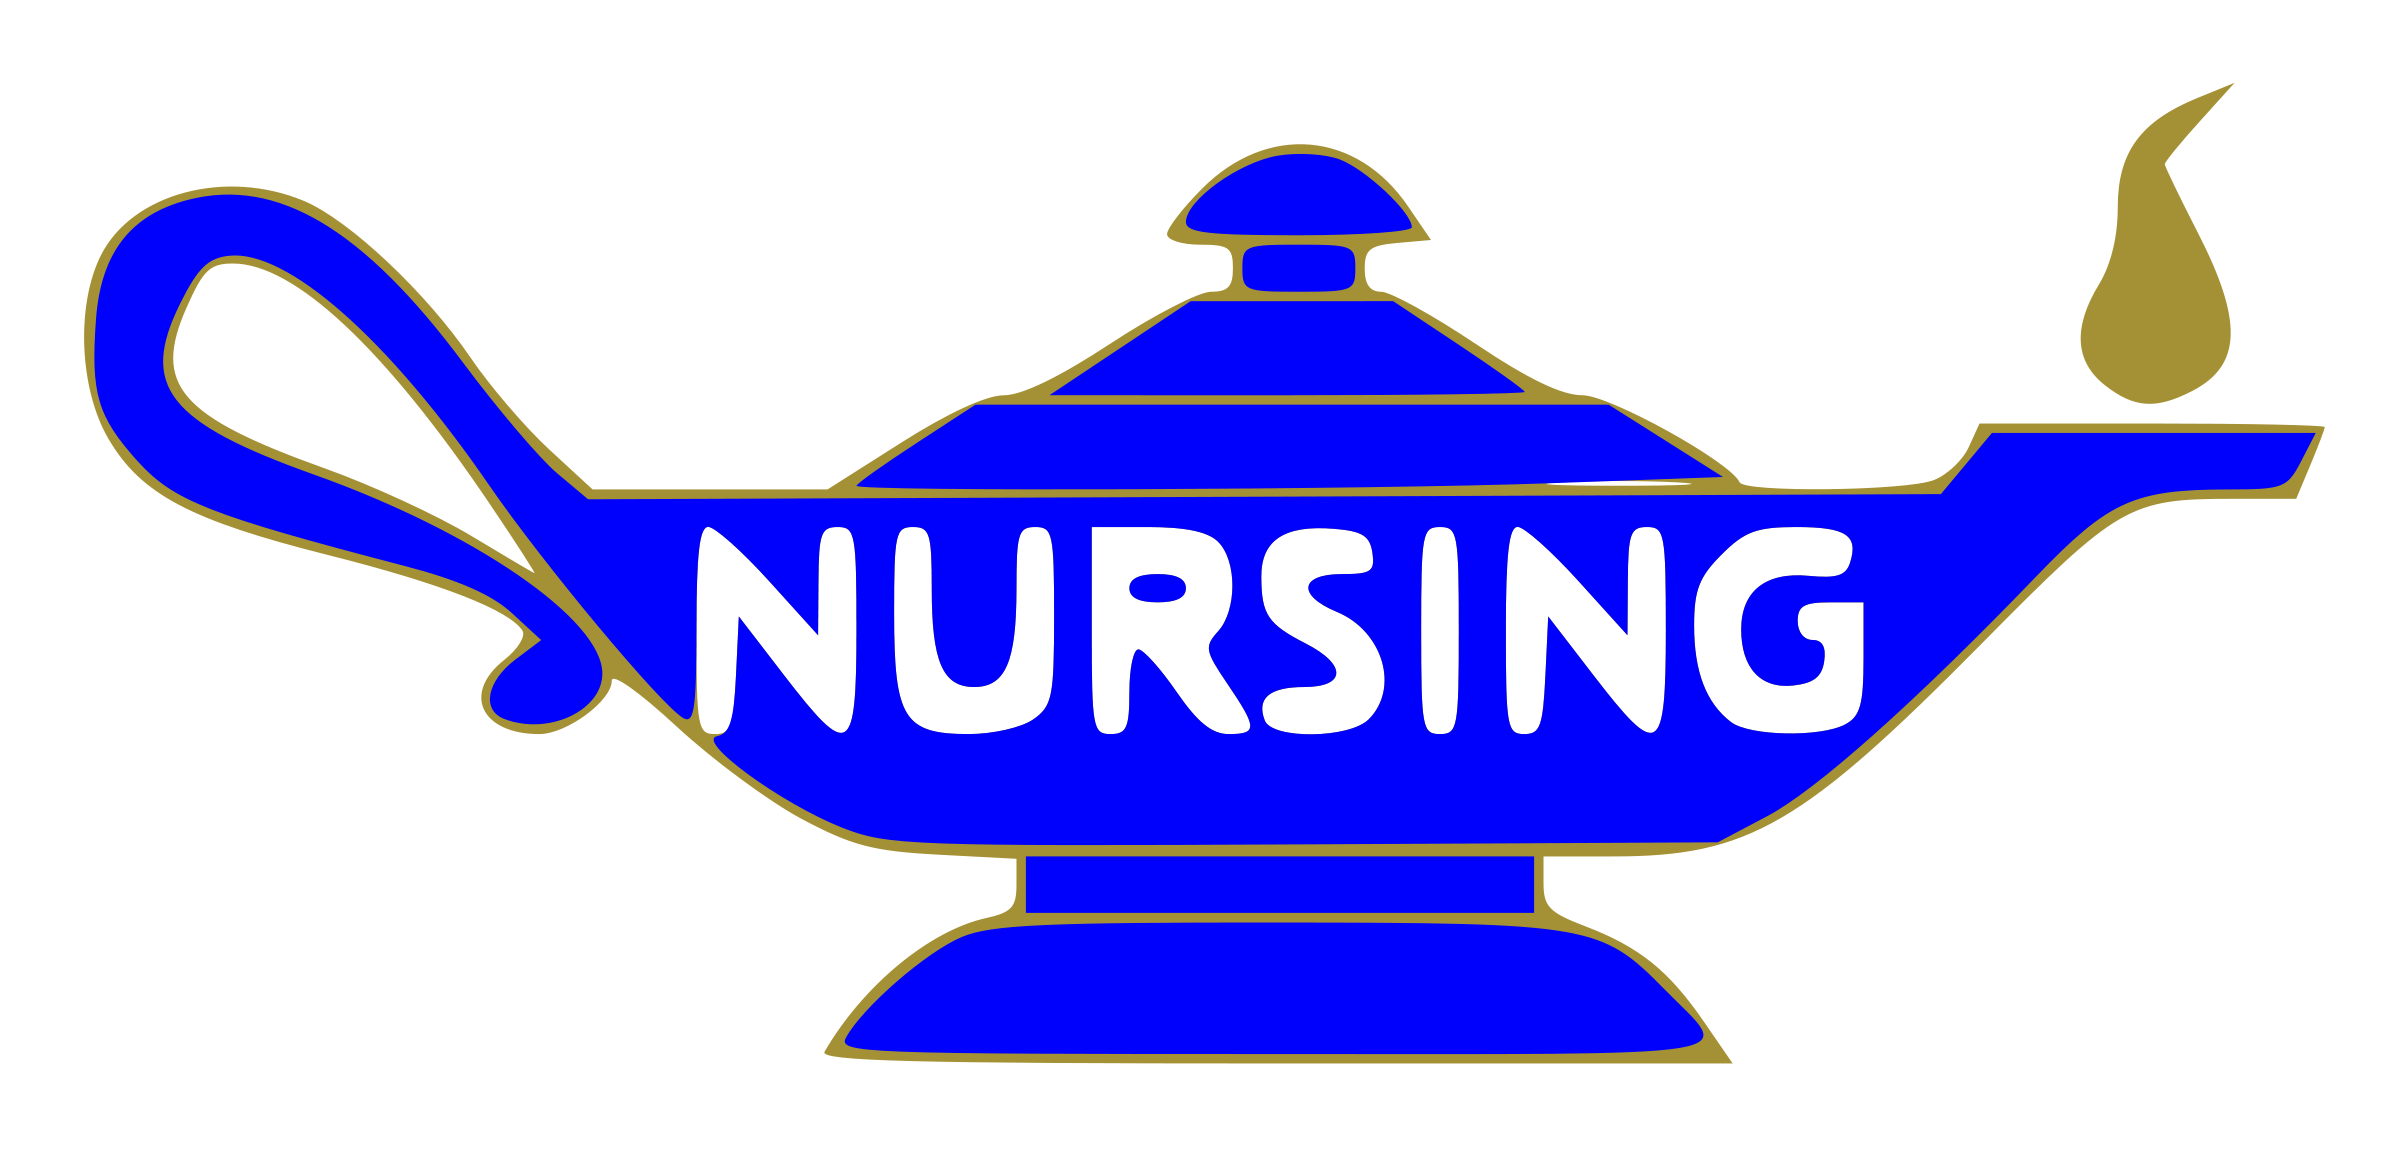 Nursing Lamp Clipart - Clipart Kid